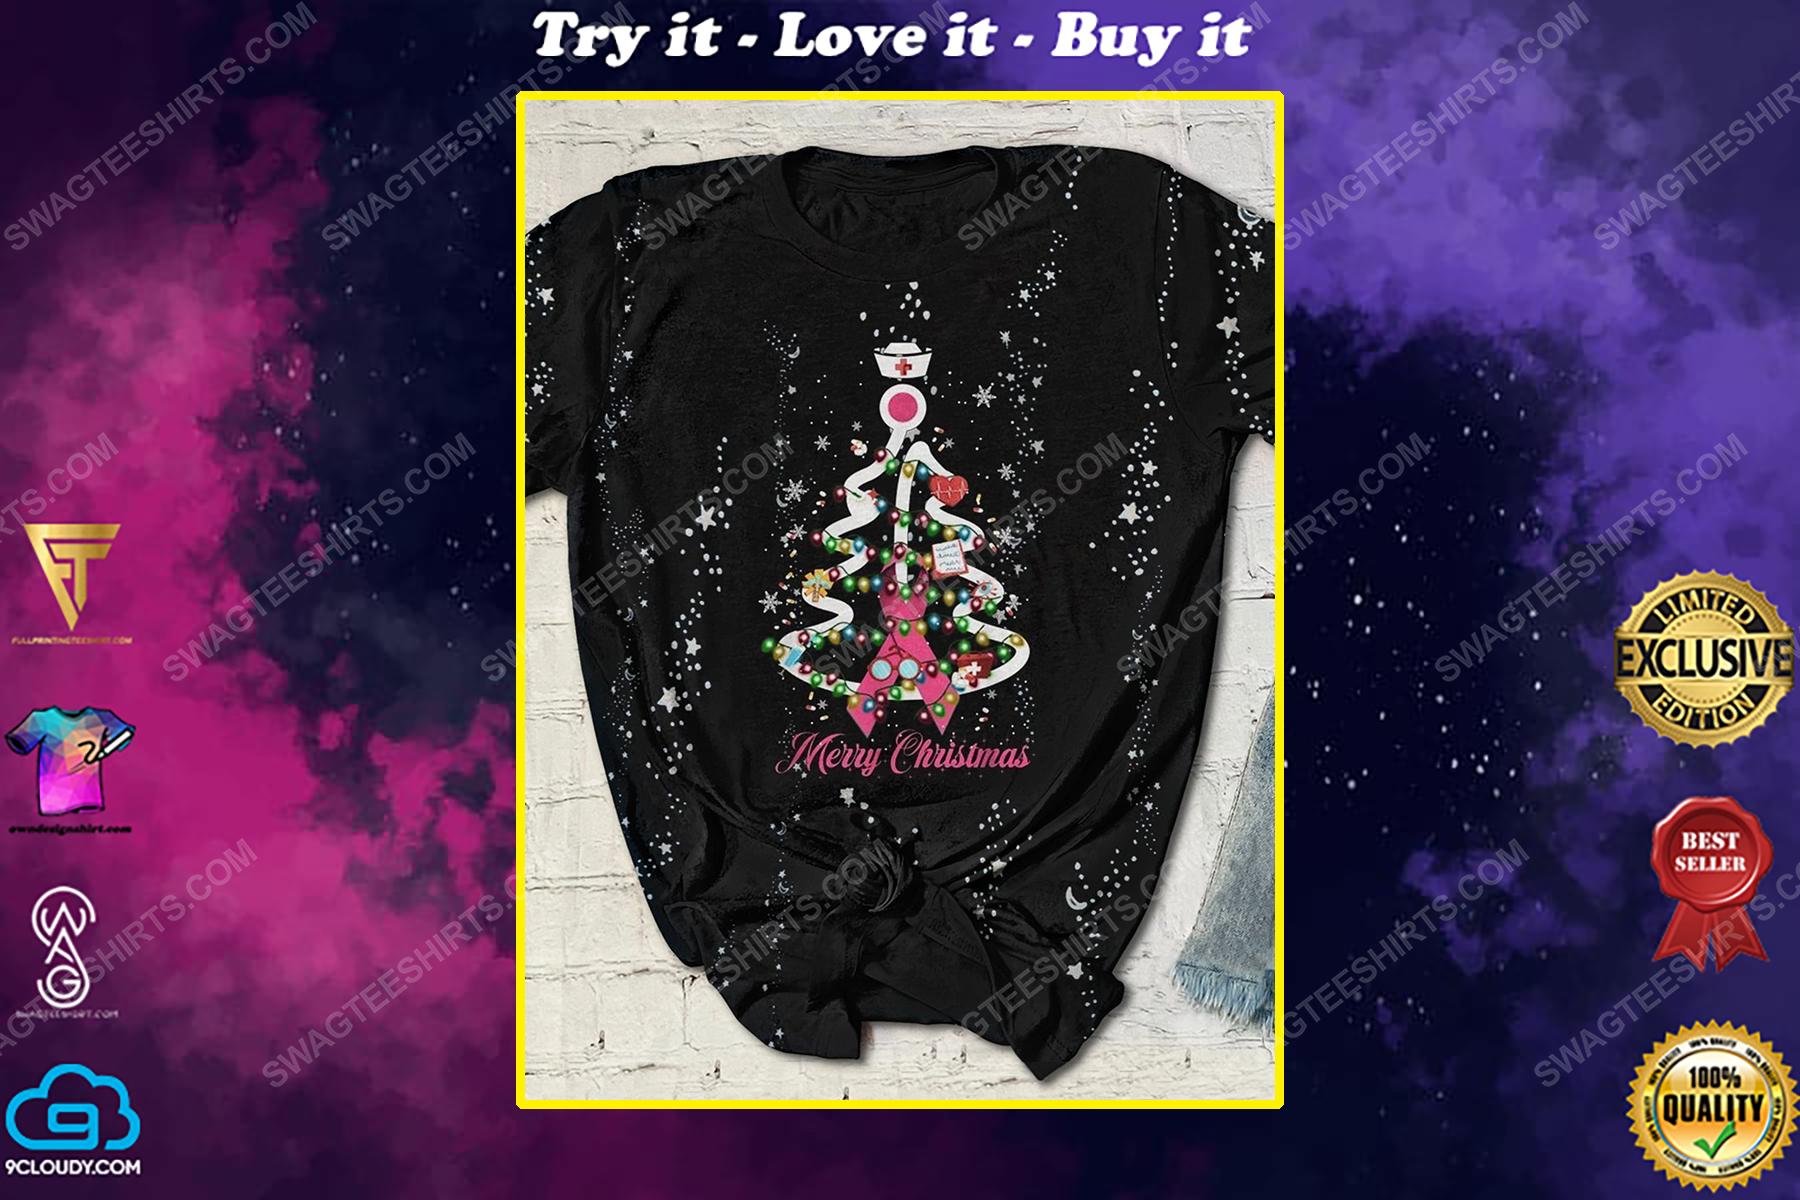 Breast cancer awareness merry christmas tree full print shirt